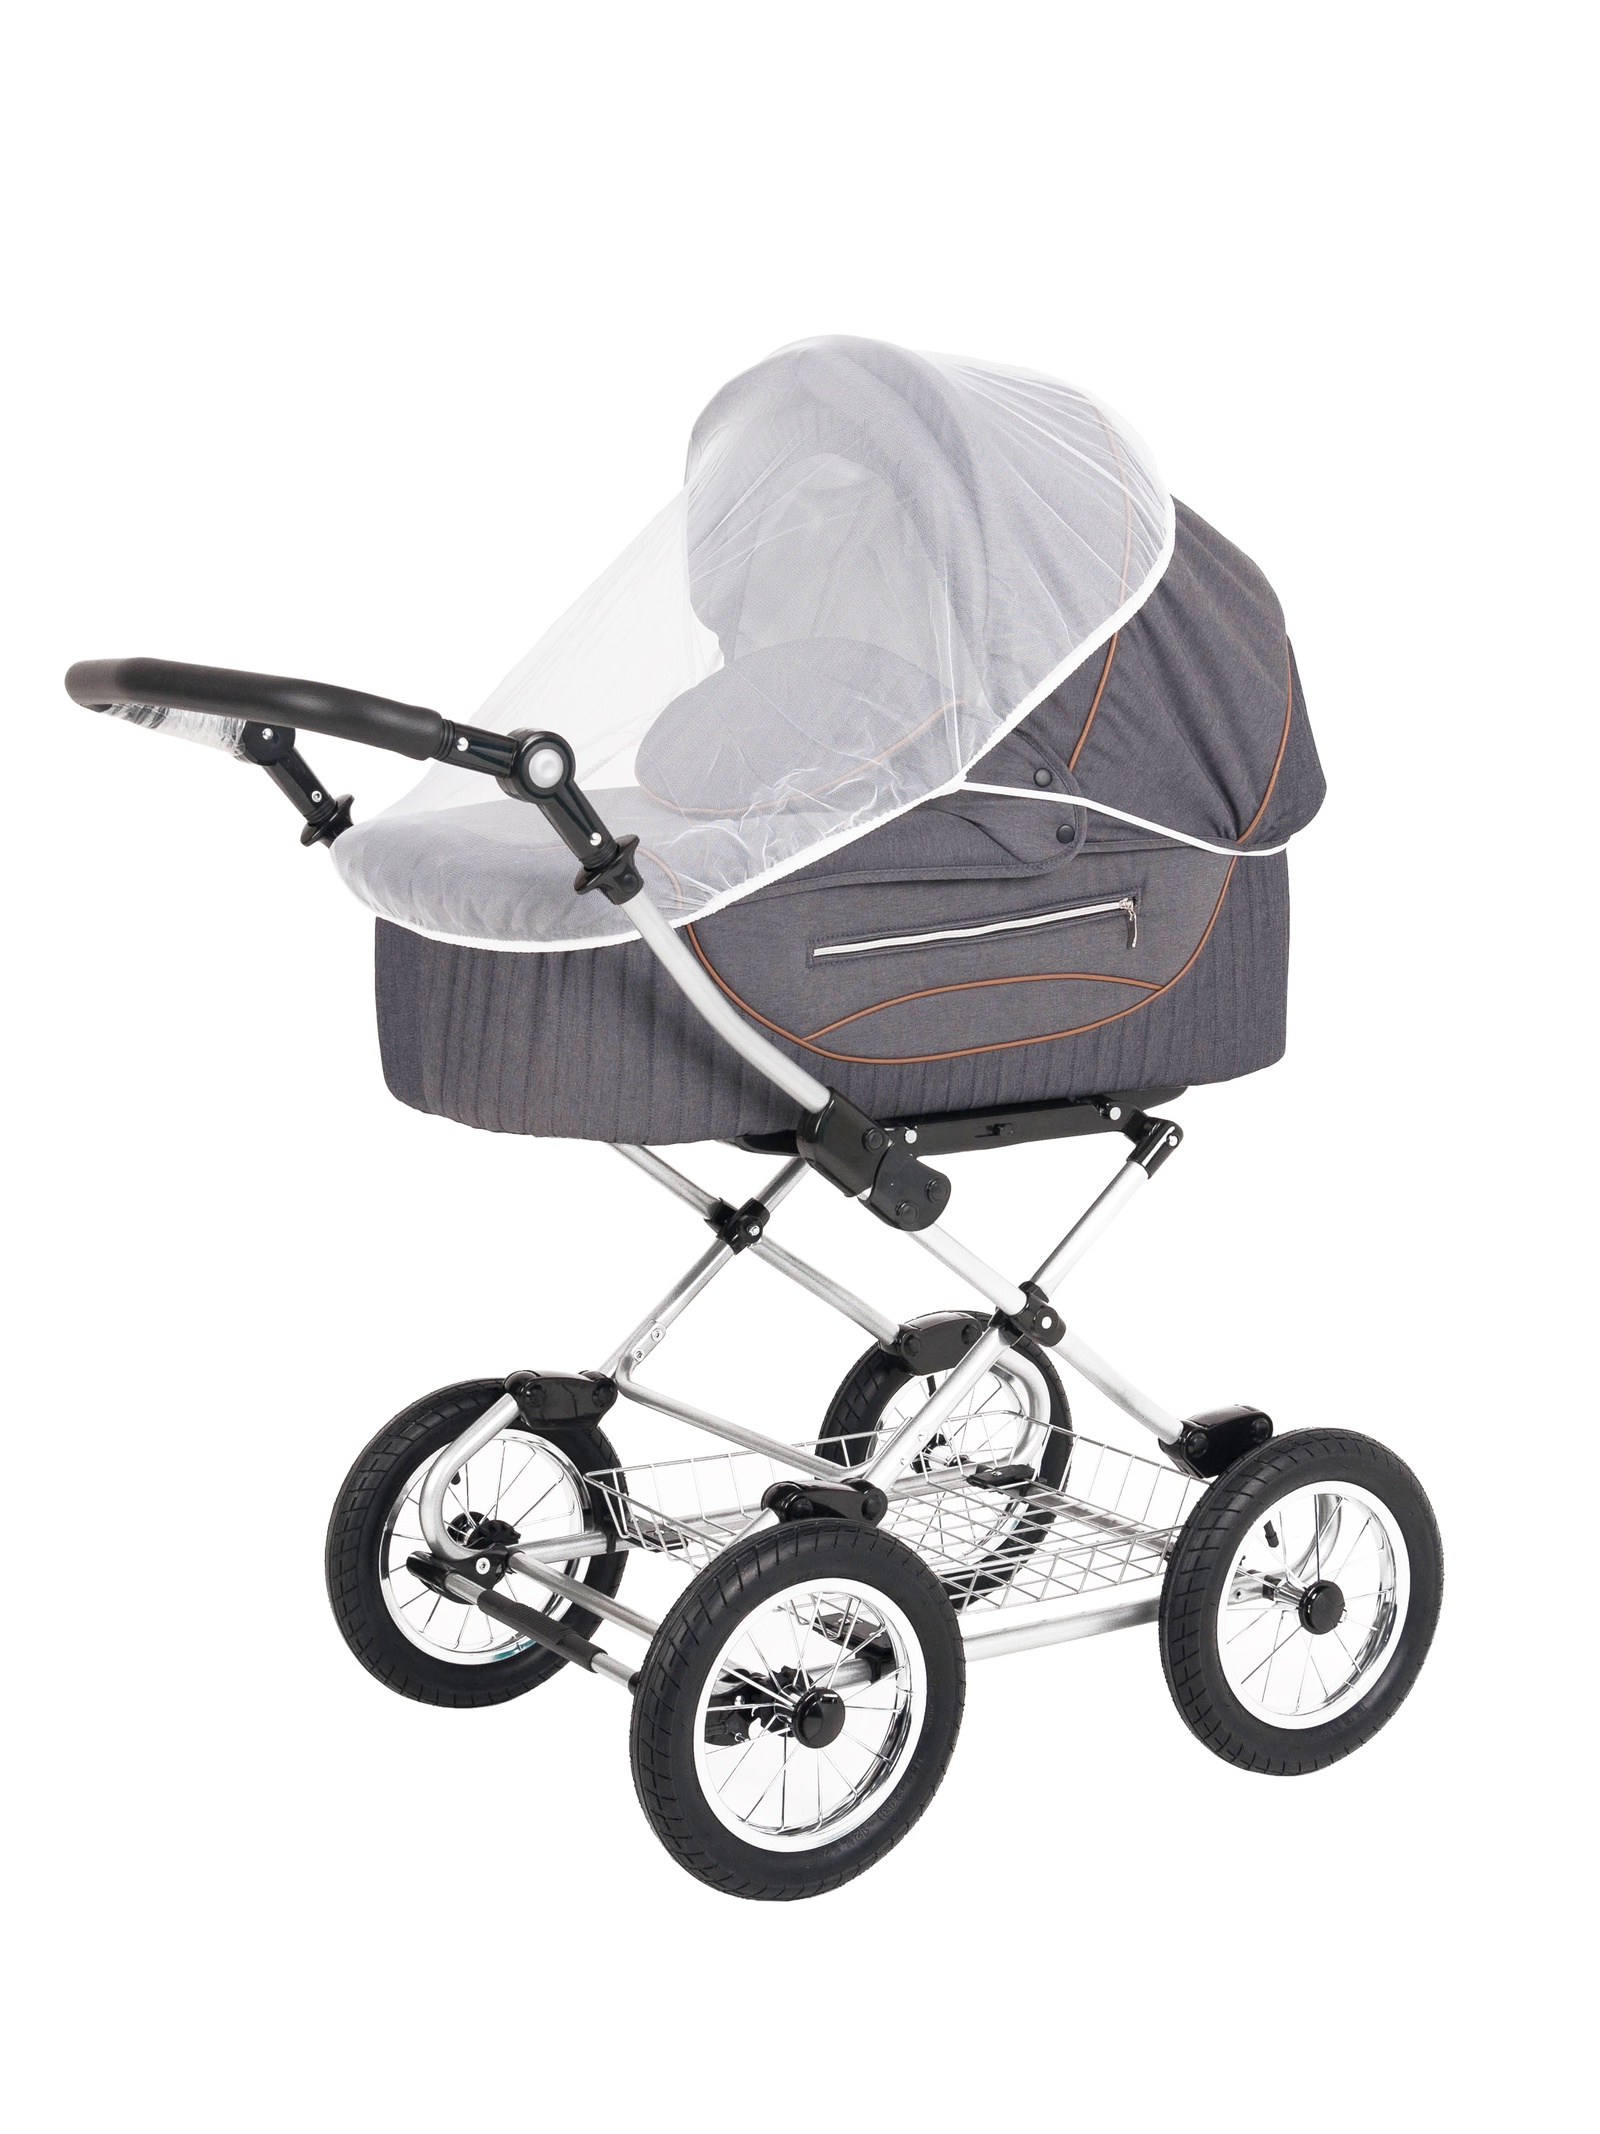 Аксессуар для колясок Trottola Москитная сетка на коляску люльку SUMMER NET CLASSIC белый москитная сетка baby care classic plus белая